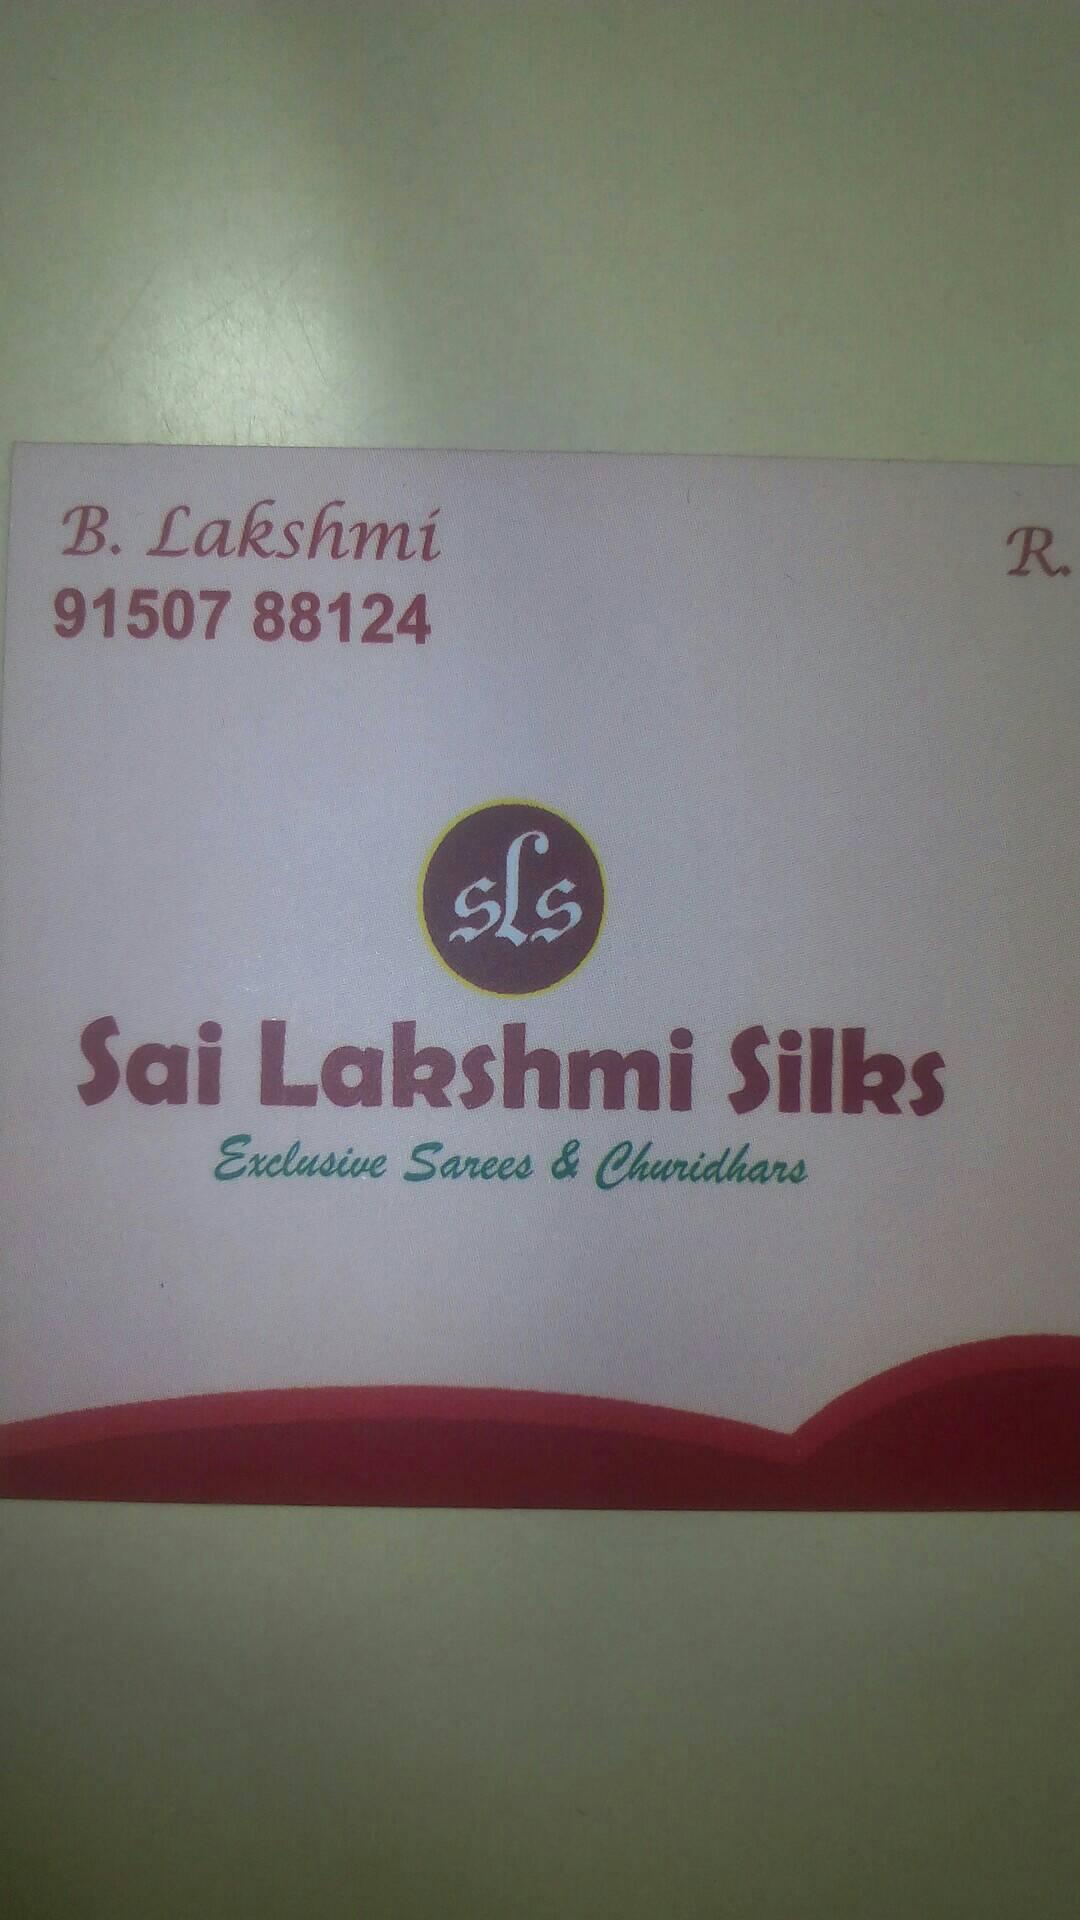 Sai Lakshmi Silks 9789526584